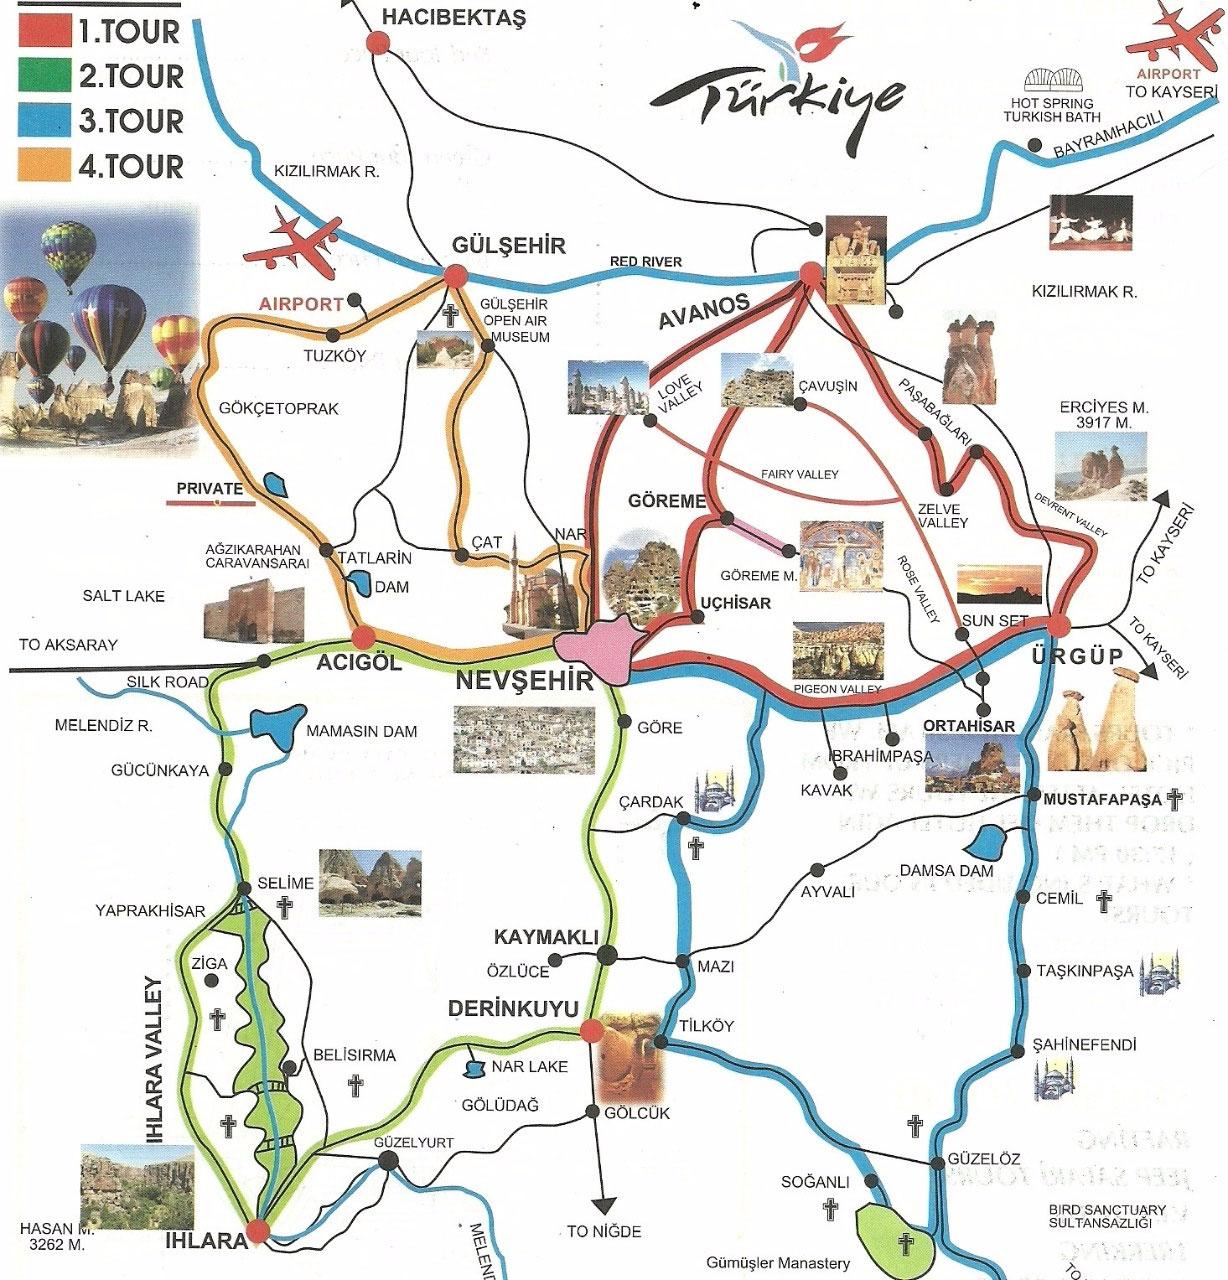 Ilhara Valley and the Green Route on ardahan map, ankara map, dolmabahce palace map, pamukkale map, carpathian mountains map, anatolia map, turkey map, tatev monastery map, kayseri map, lycian sea map, macedonia map, bitlis map, nevsehir pazar map, cilicia map, underground city, mount nemrut, campania map, pontus map, troy map, goreme map, mount ararat, derinkuyu underground city, phthia map, ephesus map,